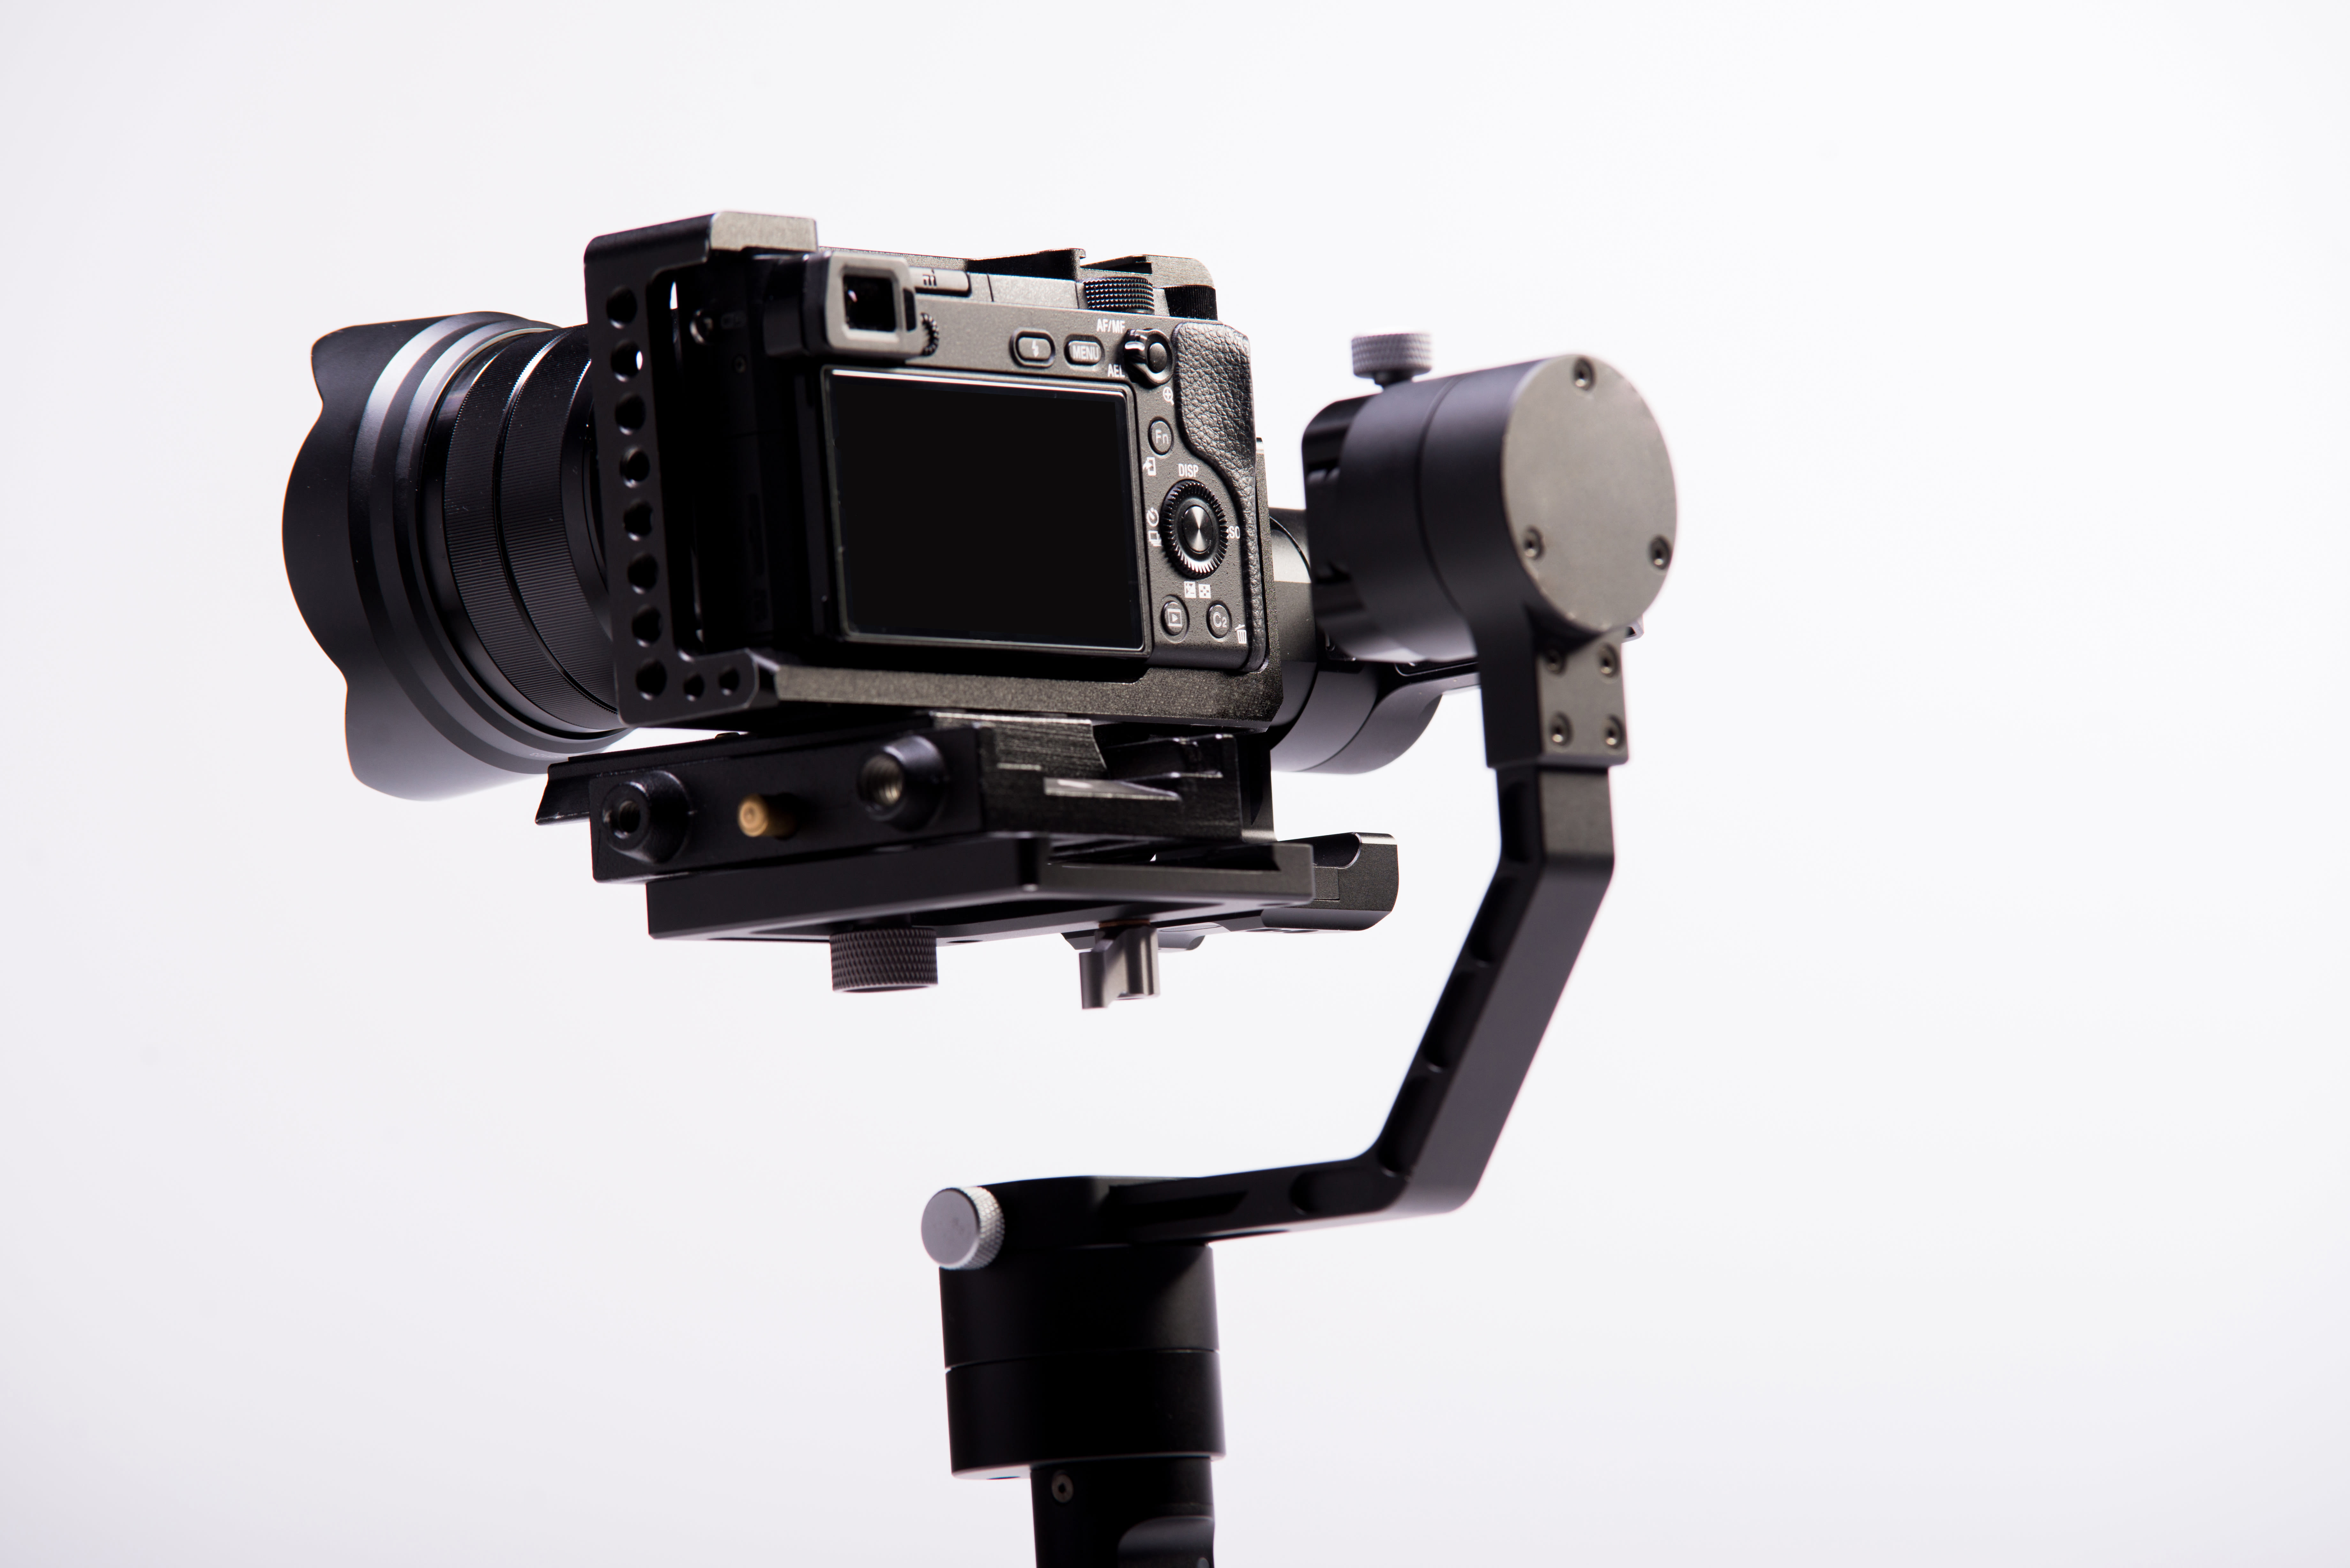 Camera on tripod.